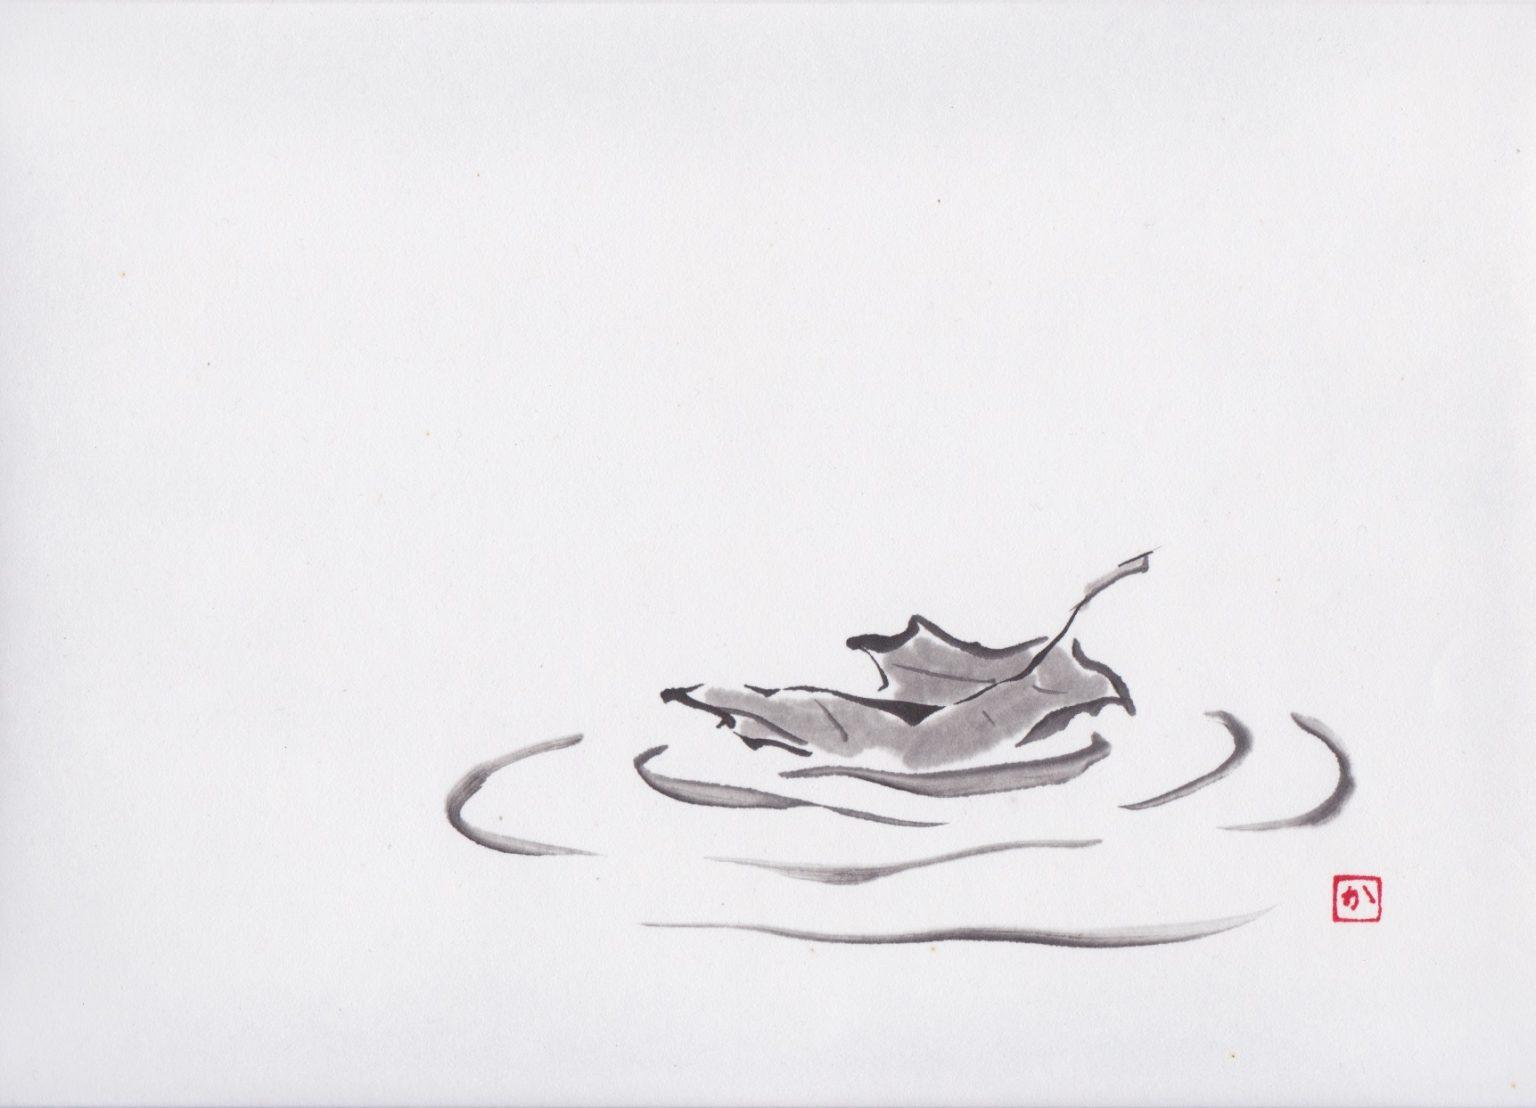 Herfstblad in water (25x21 cm)